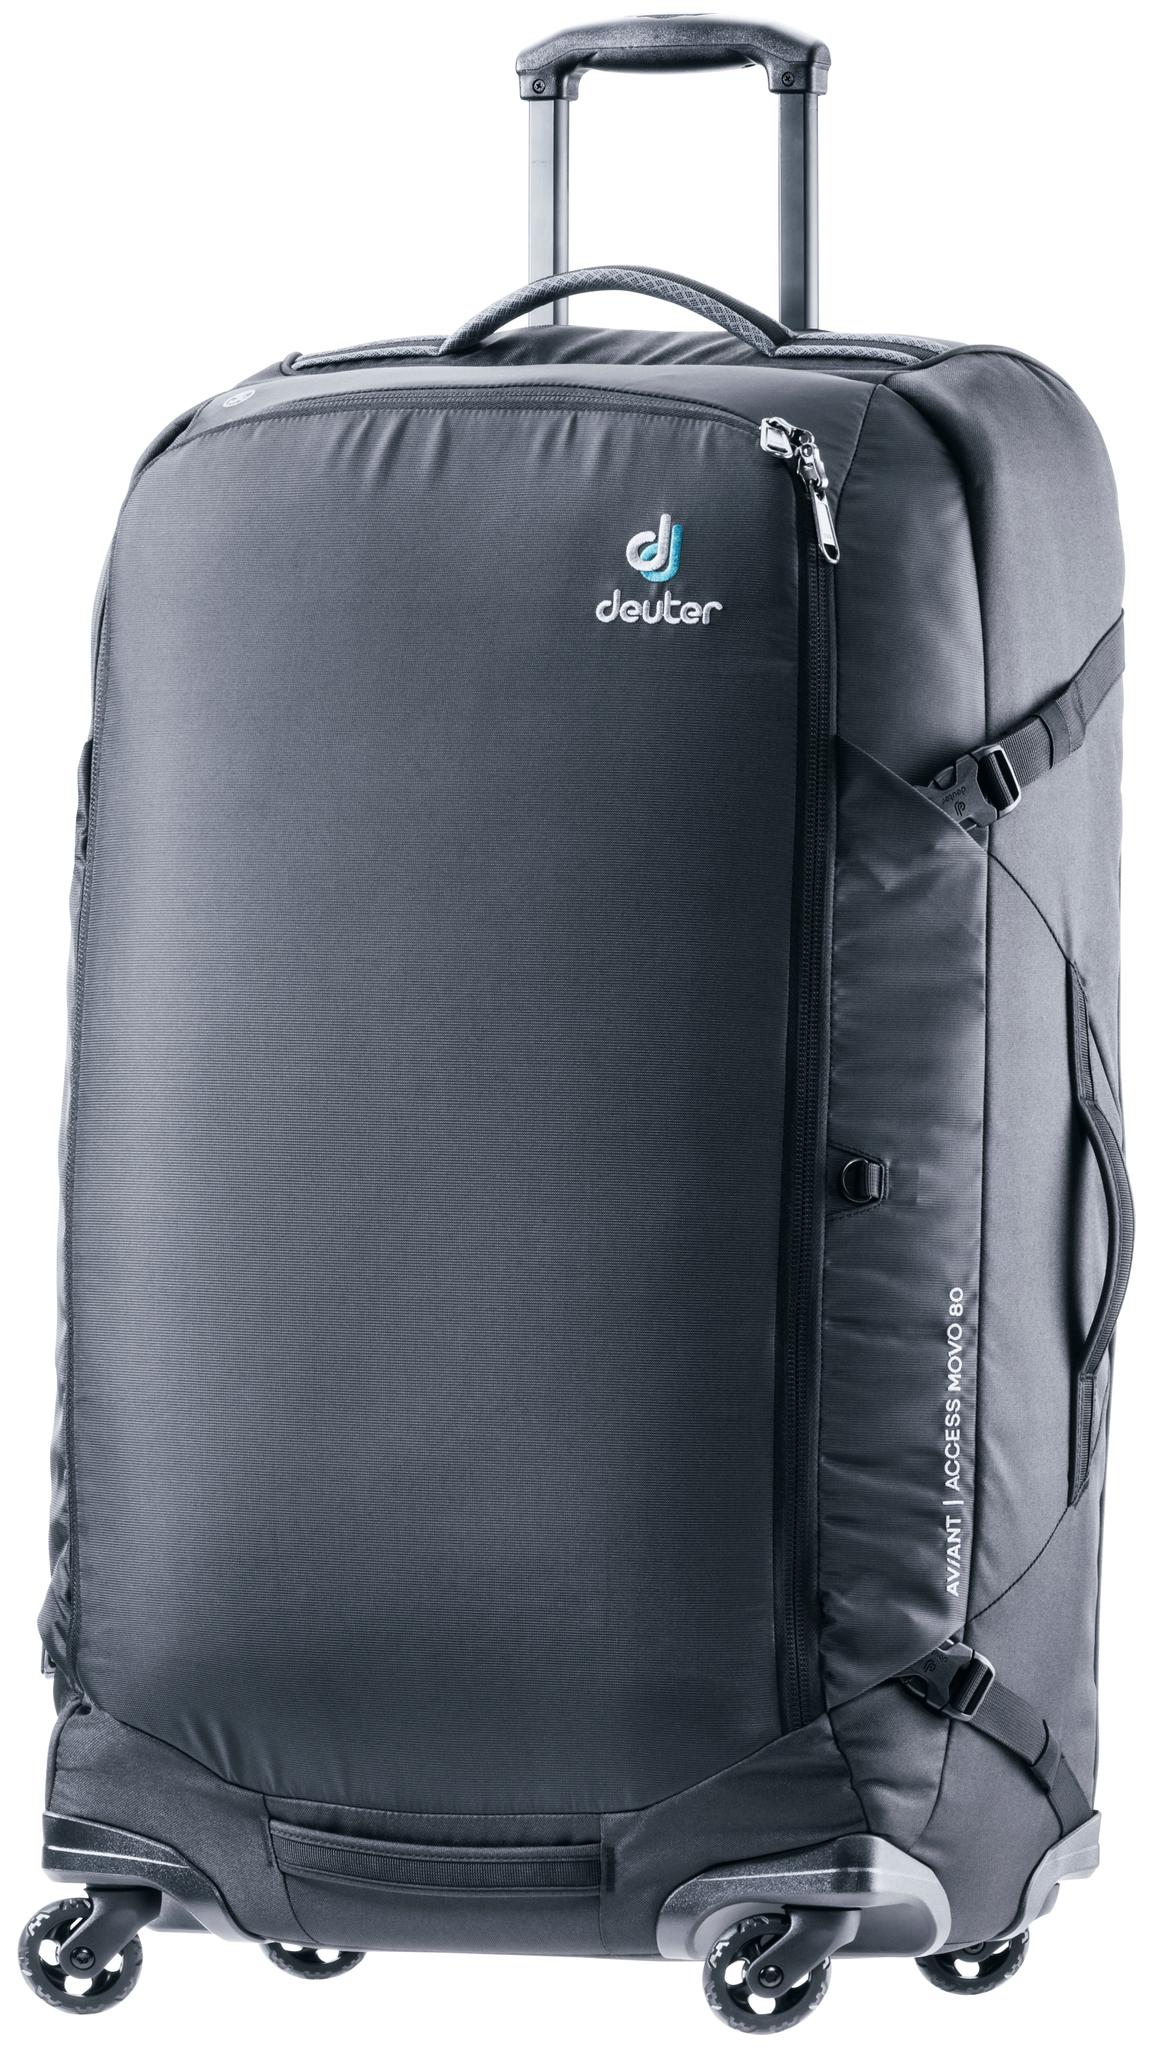 Сумки-рюкзаки Сумка рюкзак на колесах Deuter Aviant Access Movo 80 3500221-7000-AviantAccessMovo80-w20-d0.jpg